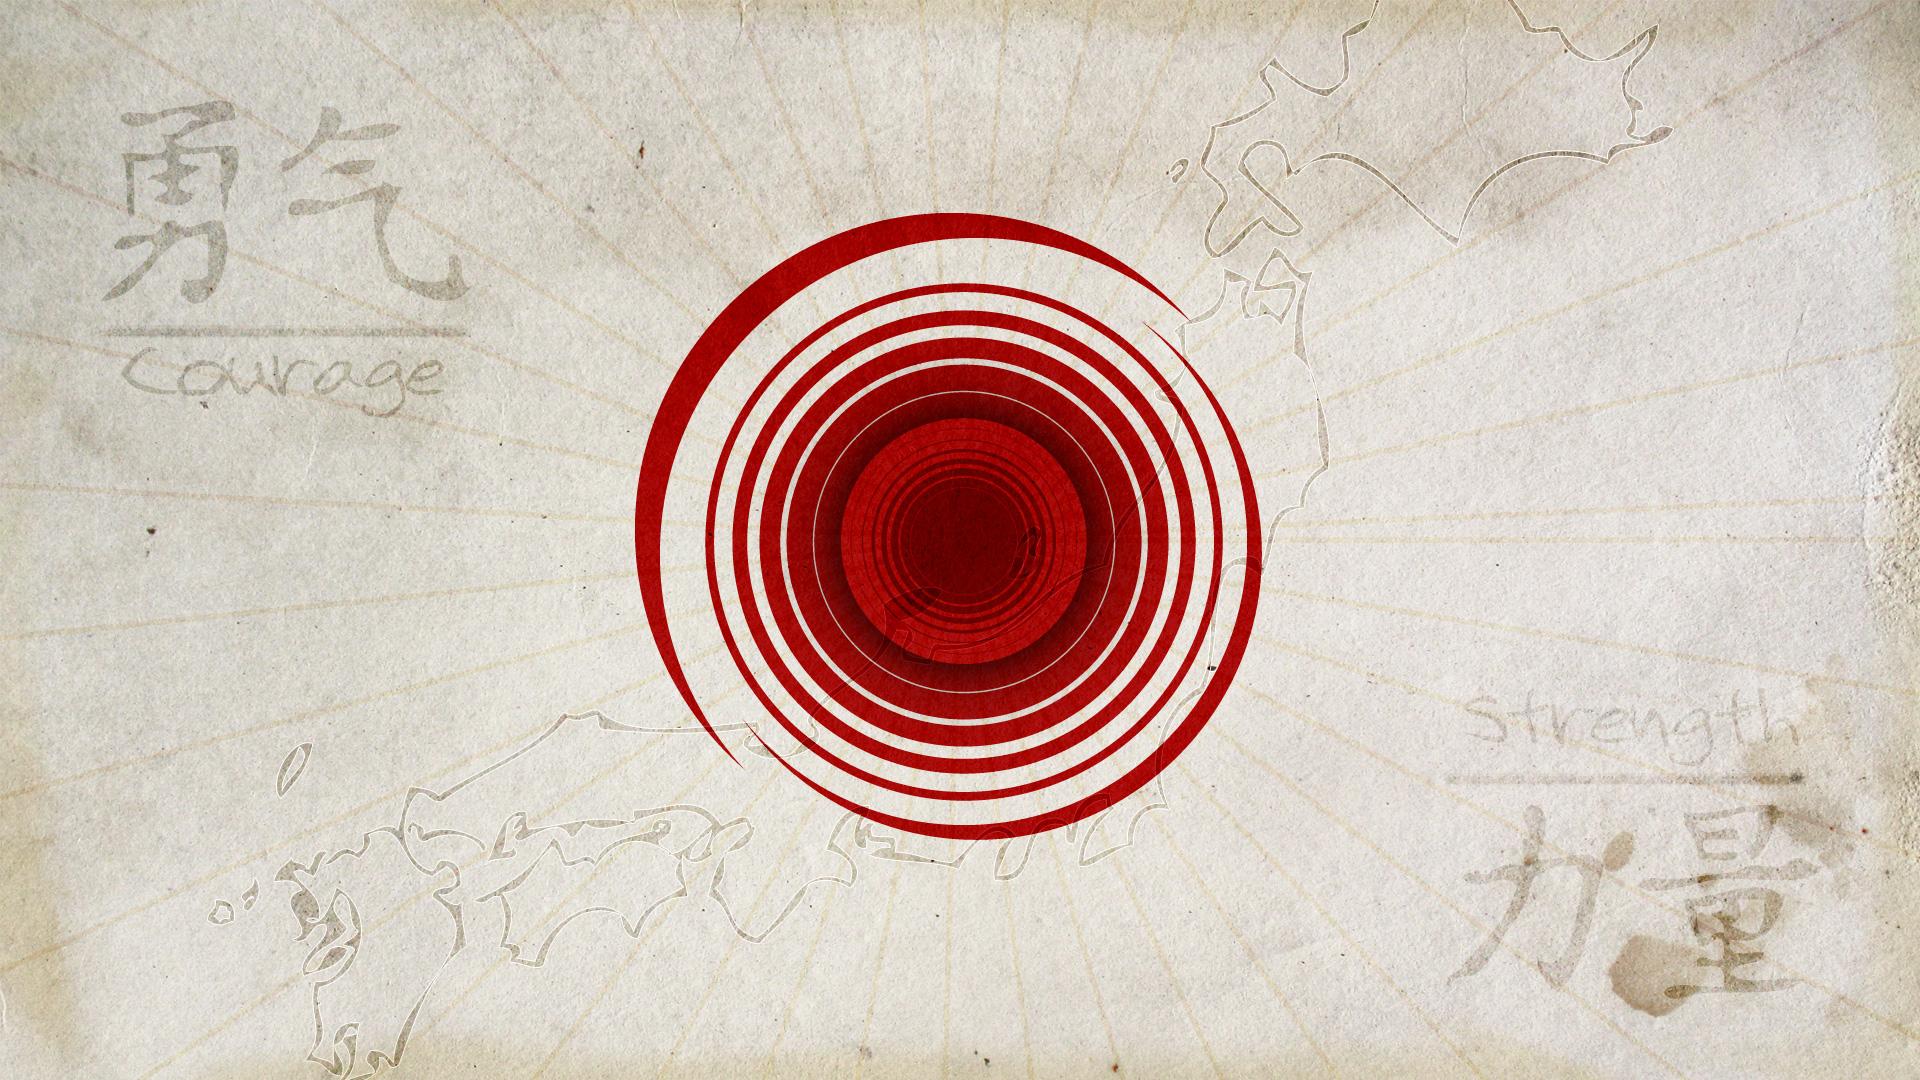 Unduh 1070+ Wallpaper Hd Japan HD Terbaik